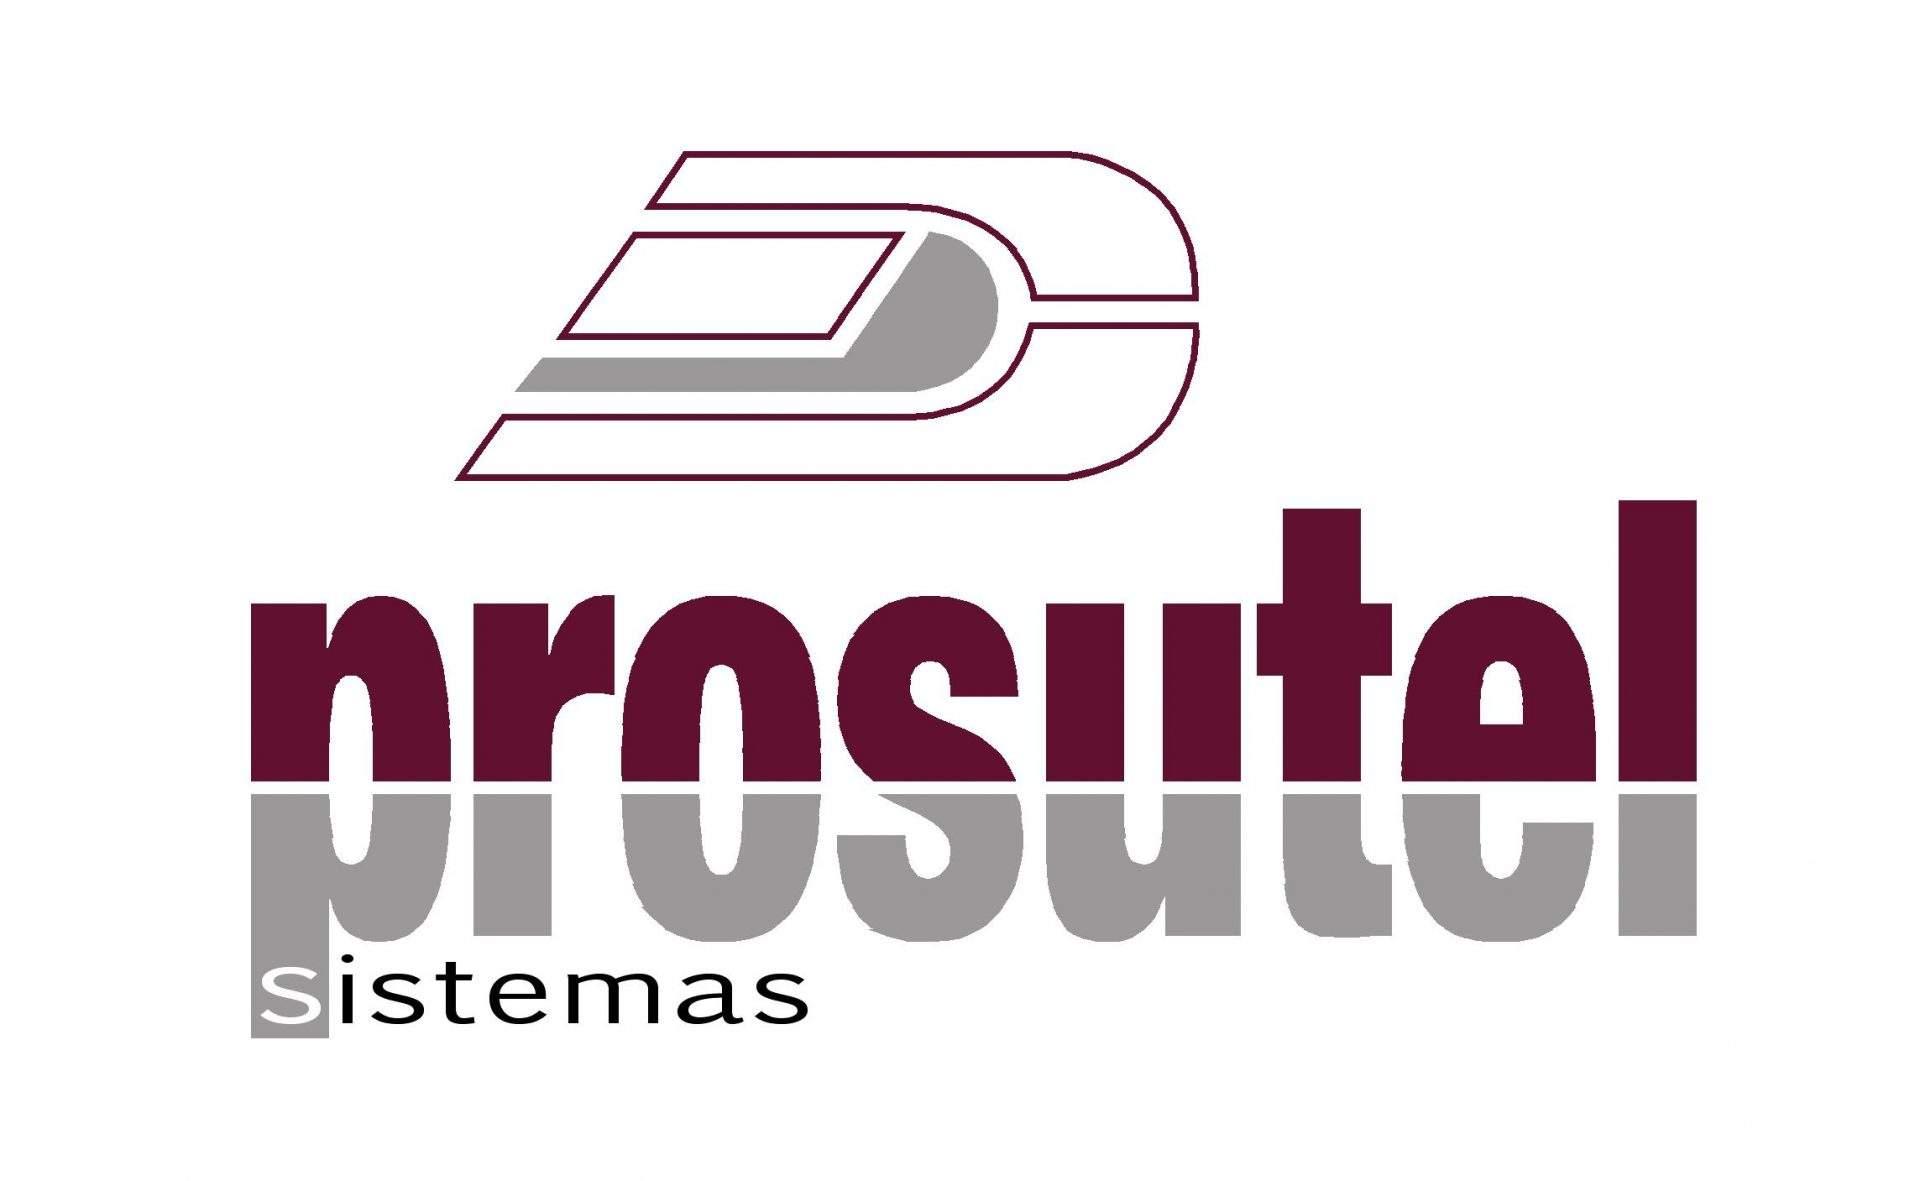 Logo prosutel sistemas